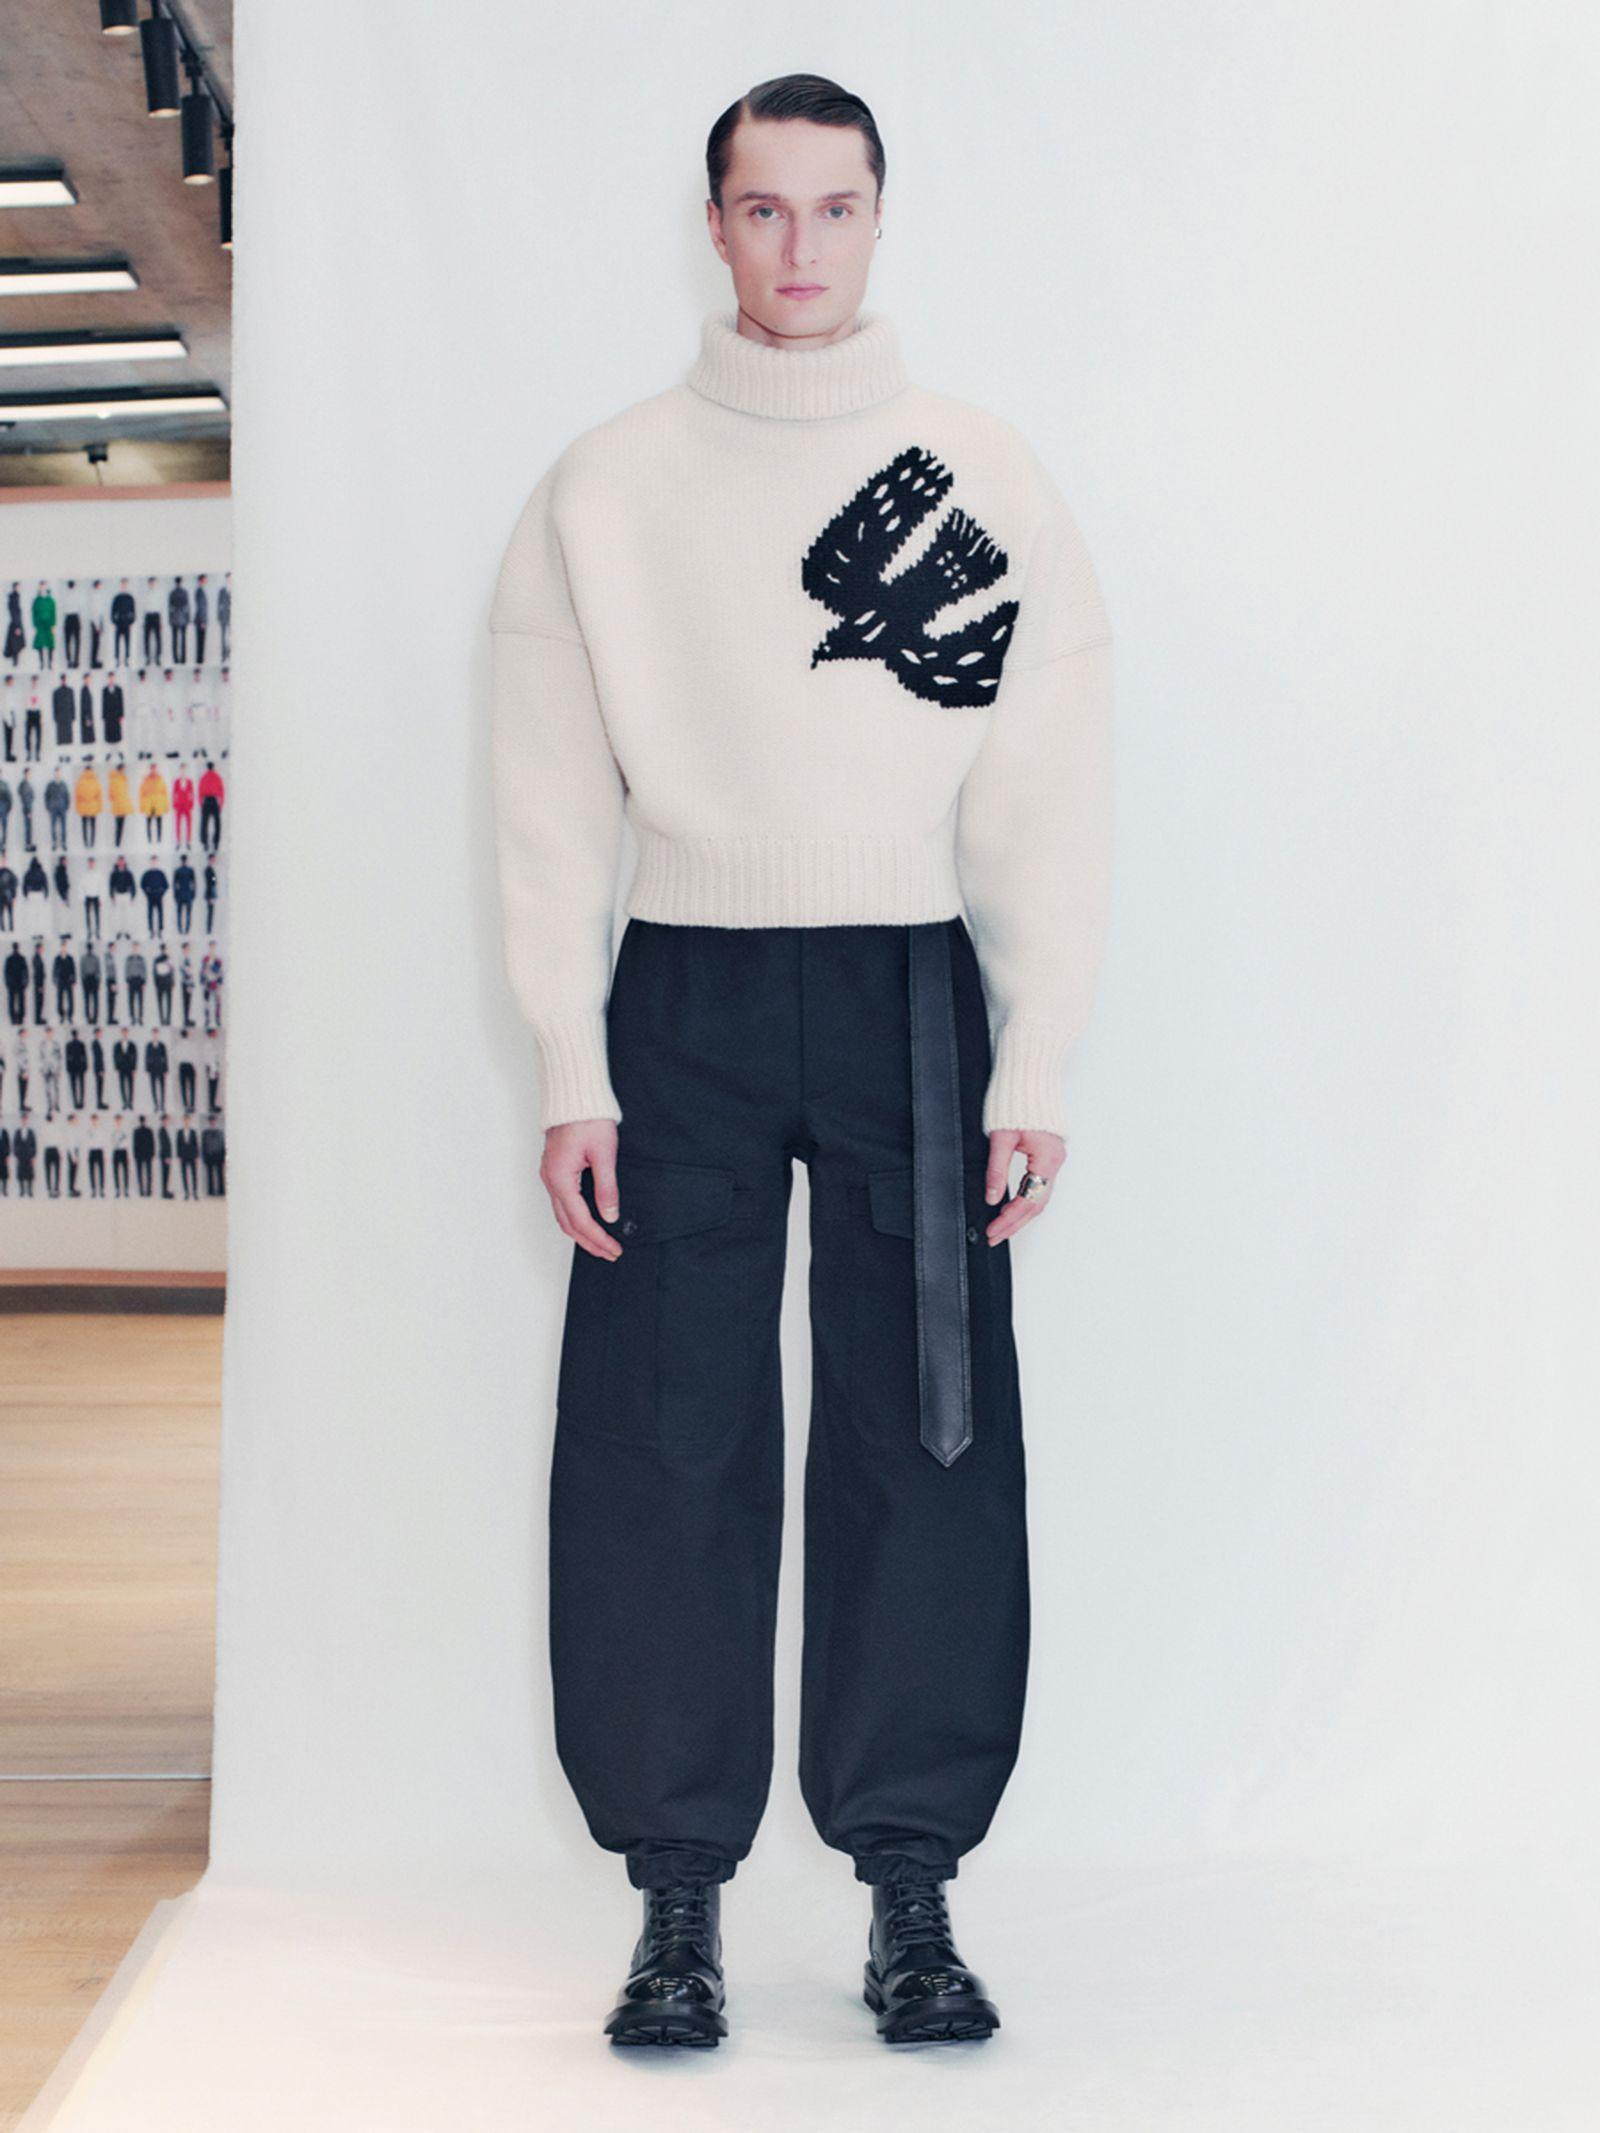 alexander-mcqueen-fall-winter-2021-collection- (22)